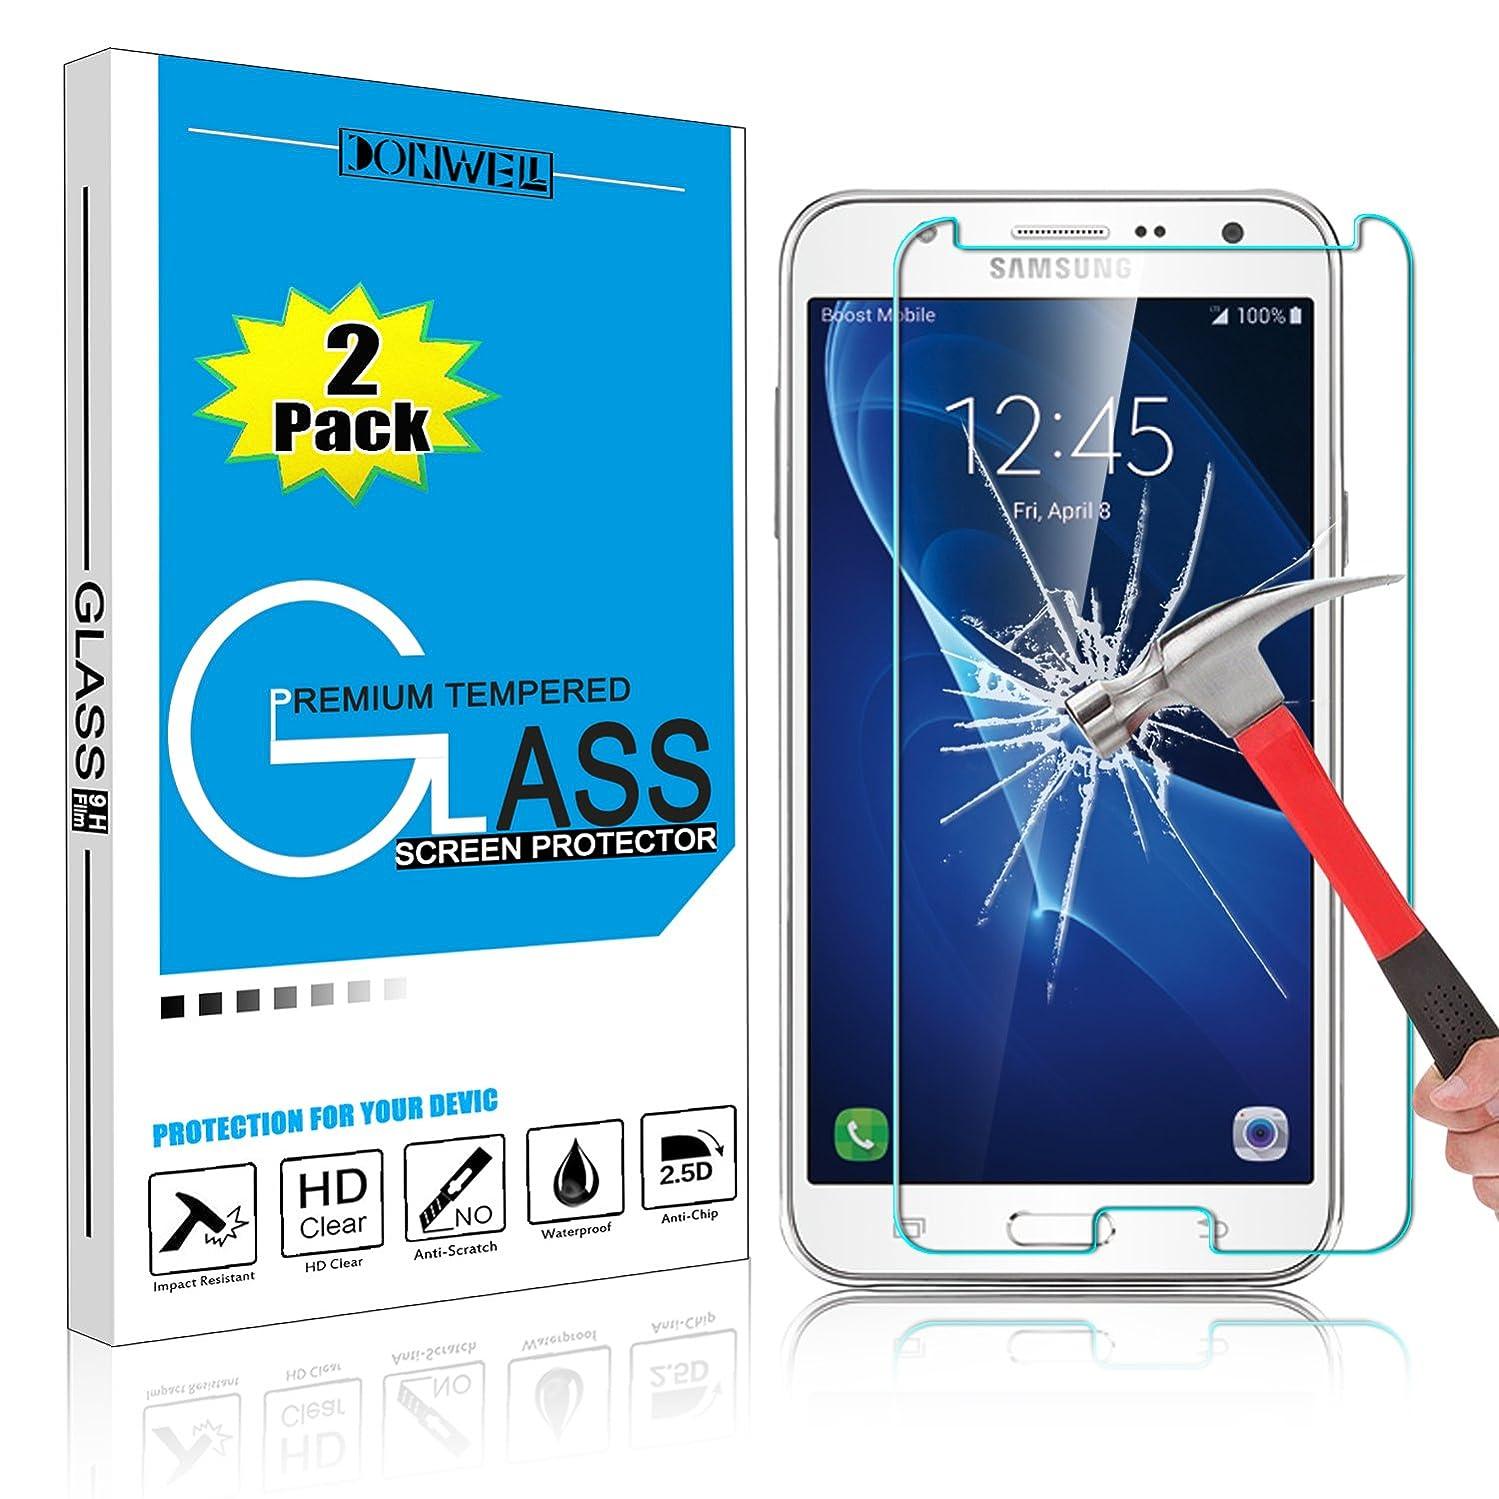 [ 2 Pack ] DONWELL Galaxy J7 2017 Tempered Glass Screen Protector Friendly Bubble Free Ultra Slim Thin Anti Scratch Cover for Samsung Galaxy J7 sky pro/J7 V/J7 Perx/SM-J730F 5.5